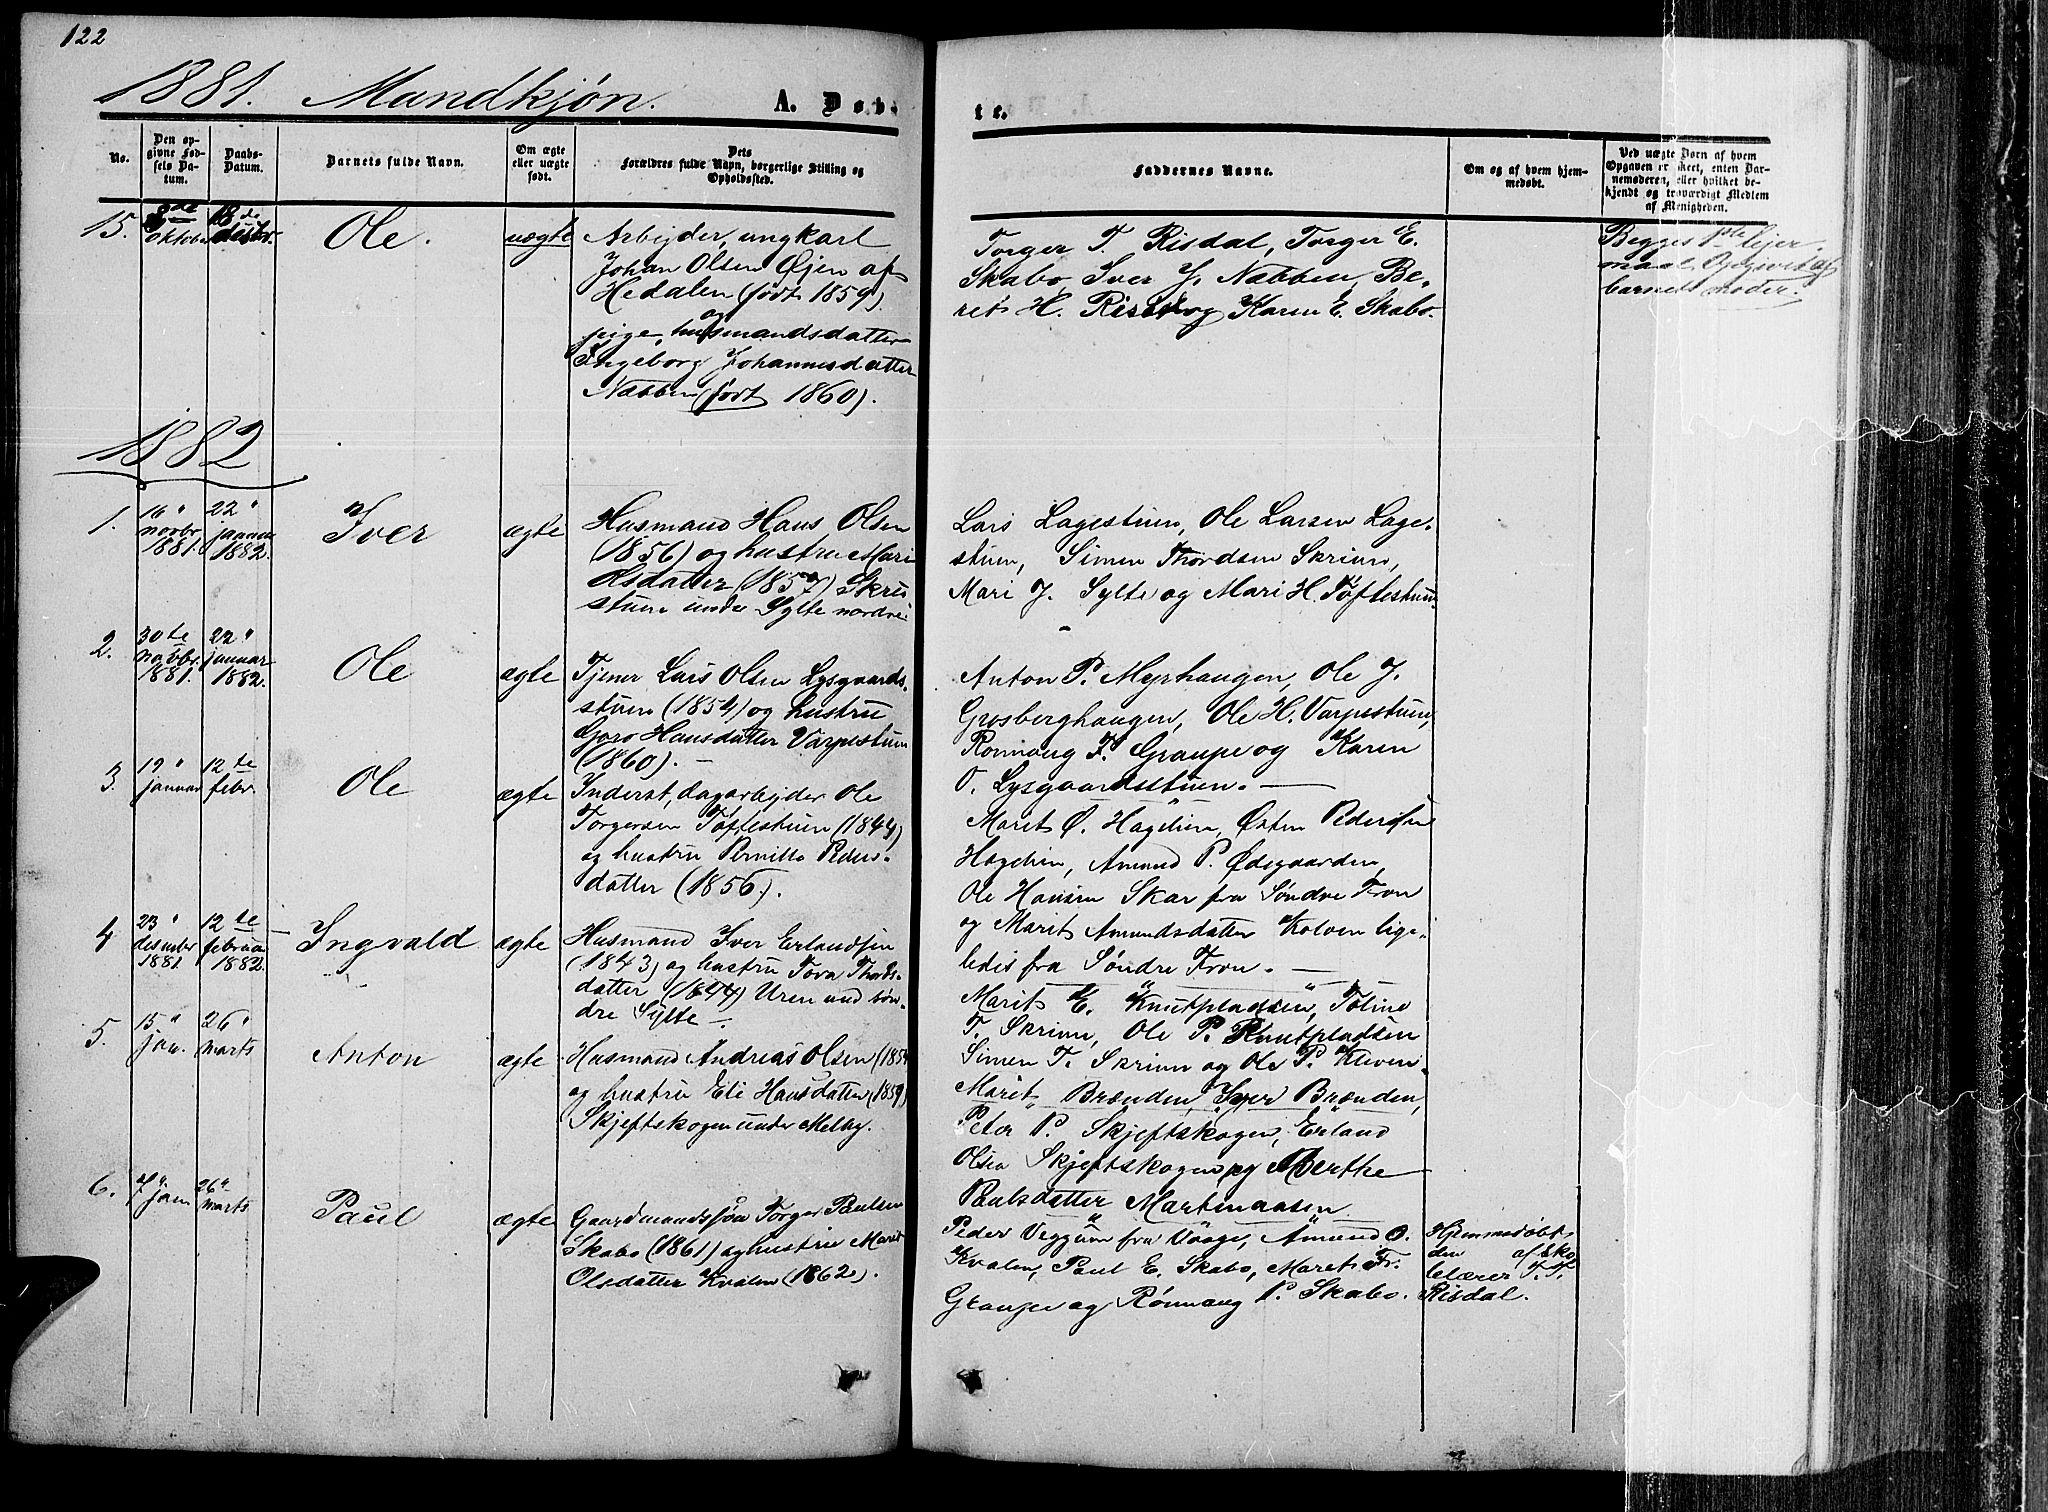 SAH, Nord-Fron prestekontor, Klokkerbok nr. 2, 1851-1883, s. 122